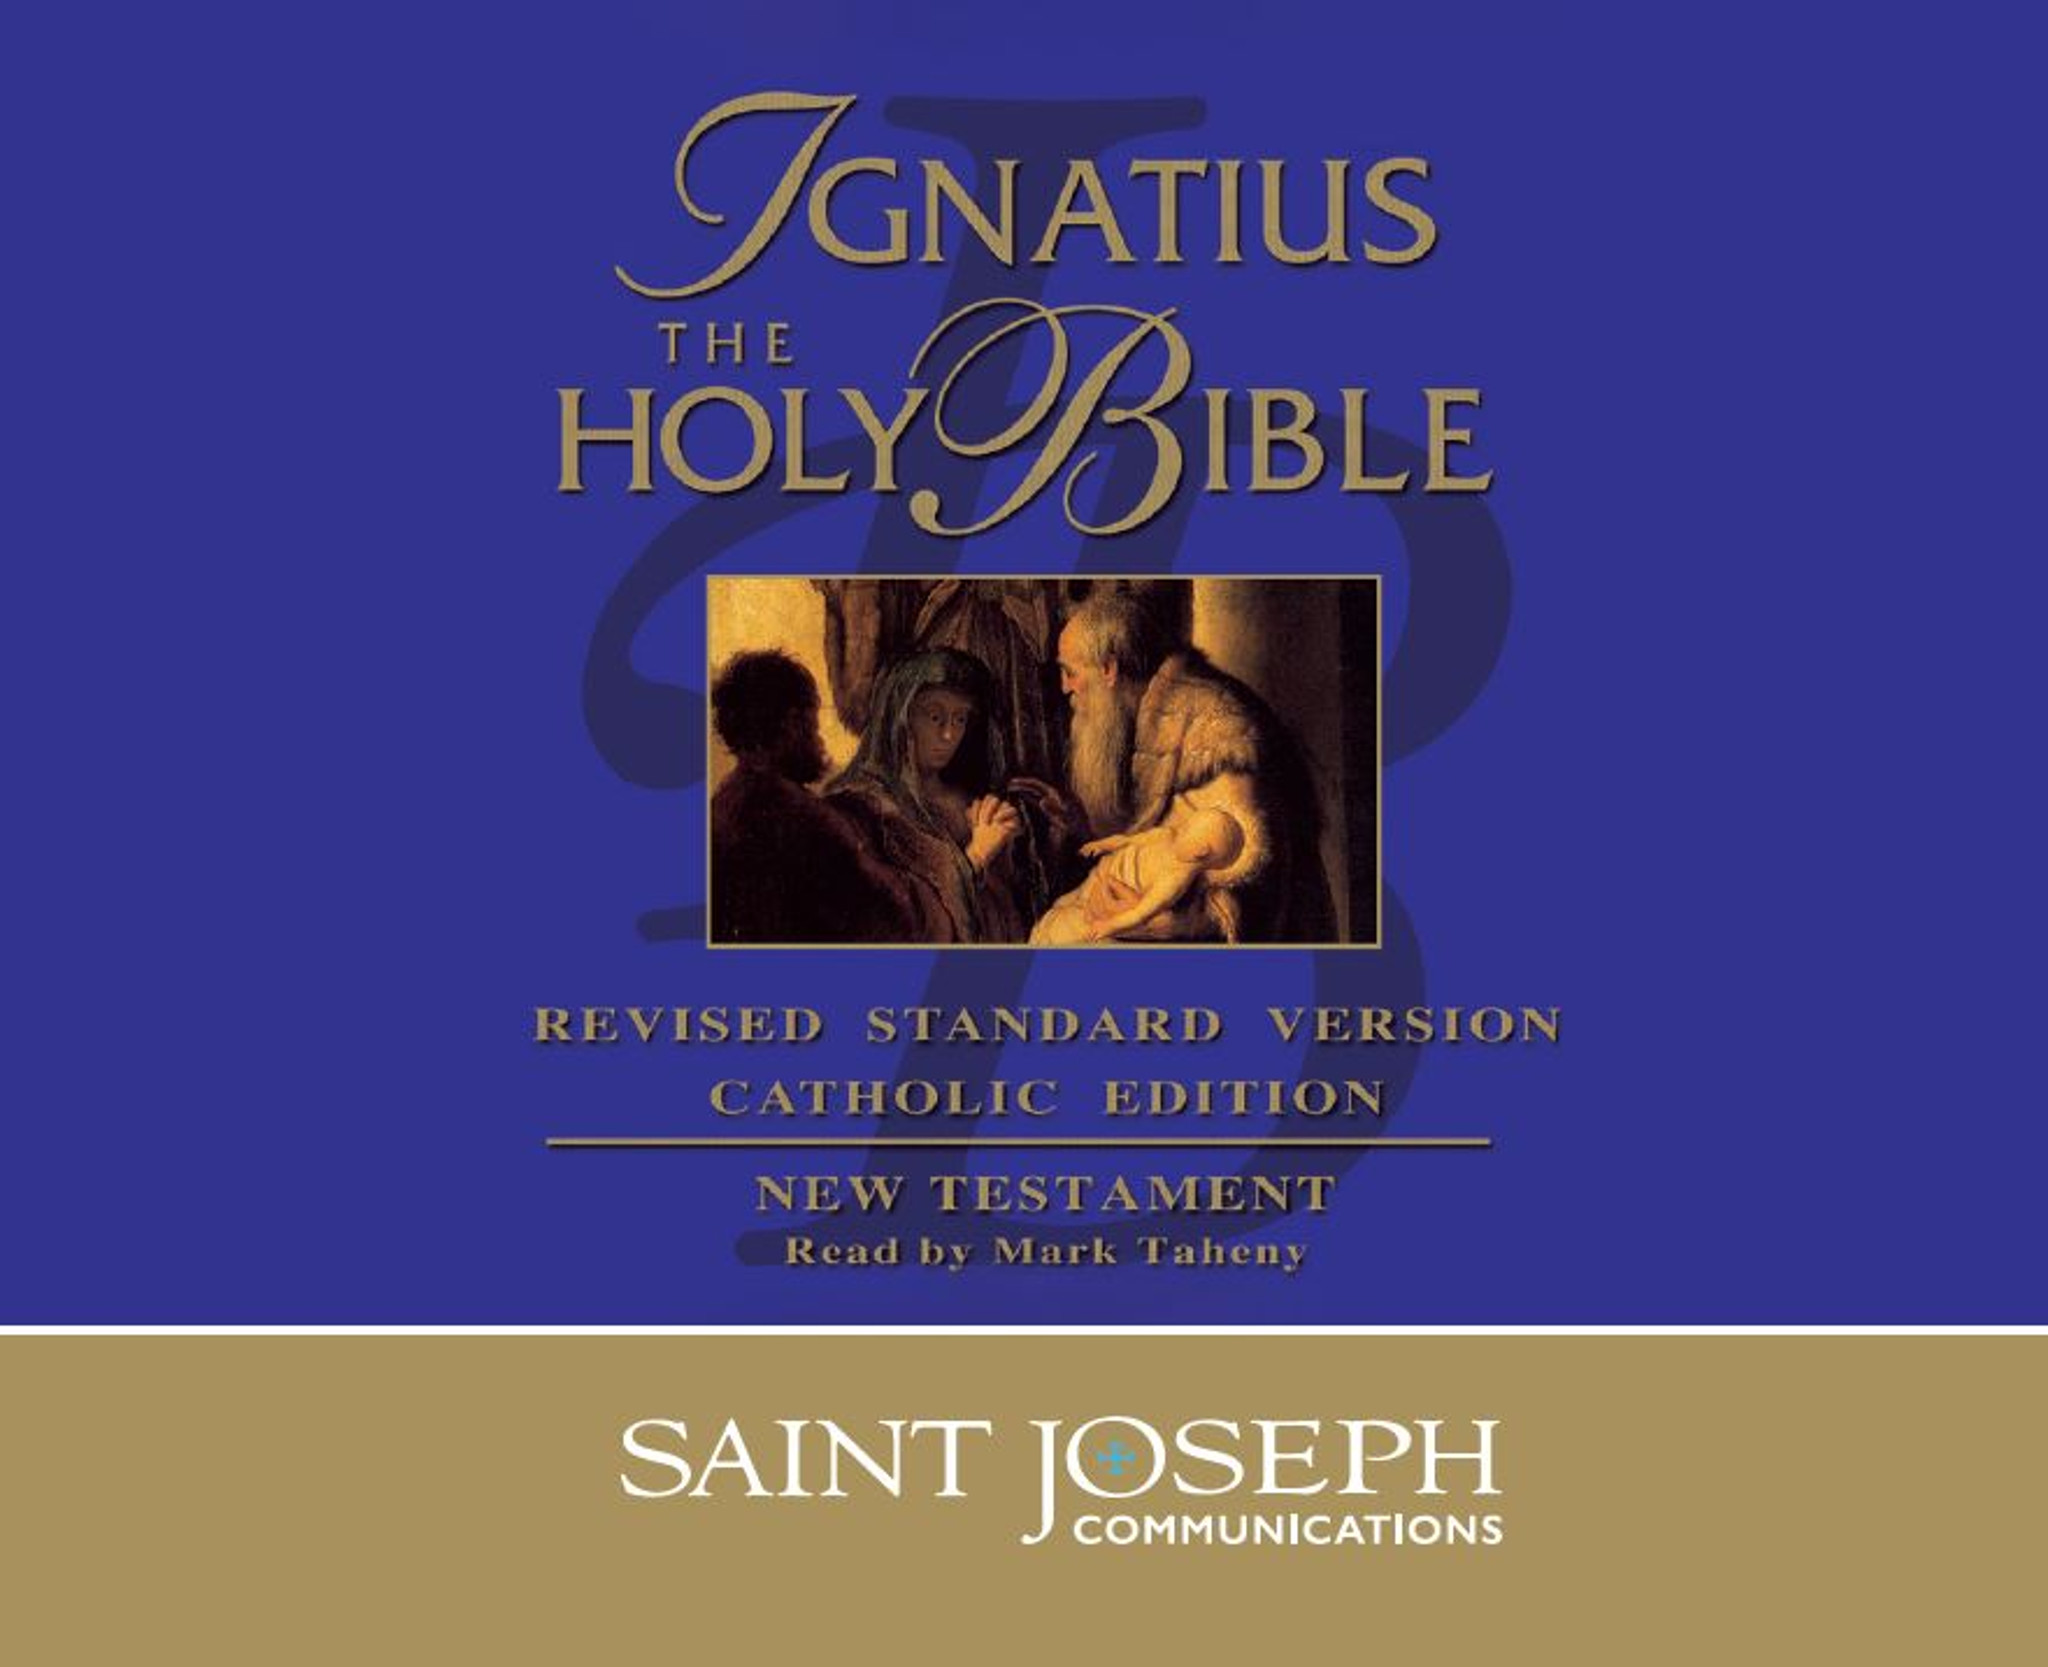 Ignatius - The Holy Bible: RSV New Testament - Audio Bible - St Joseph  Communications - 14CD Set